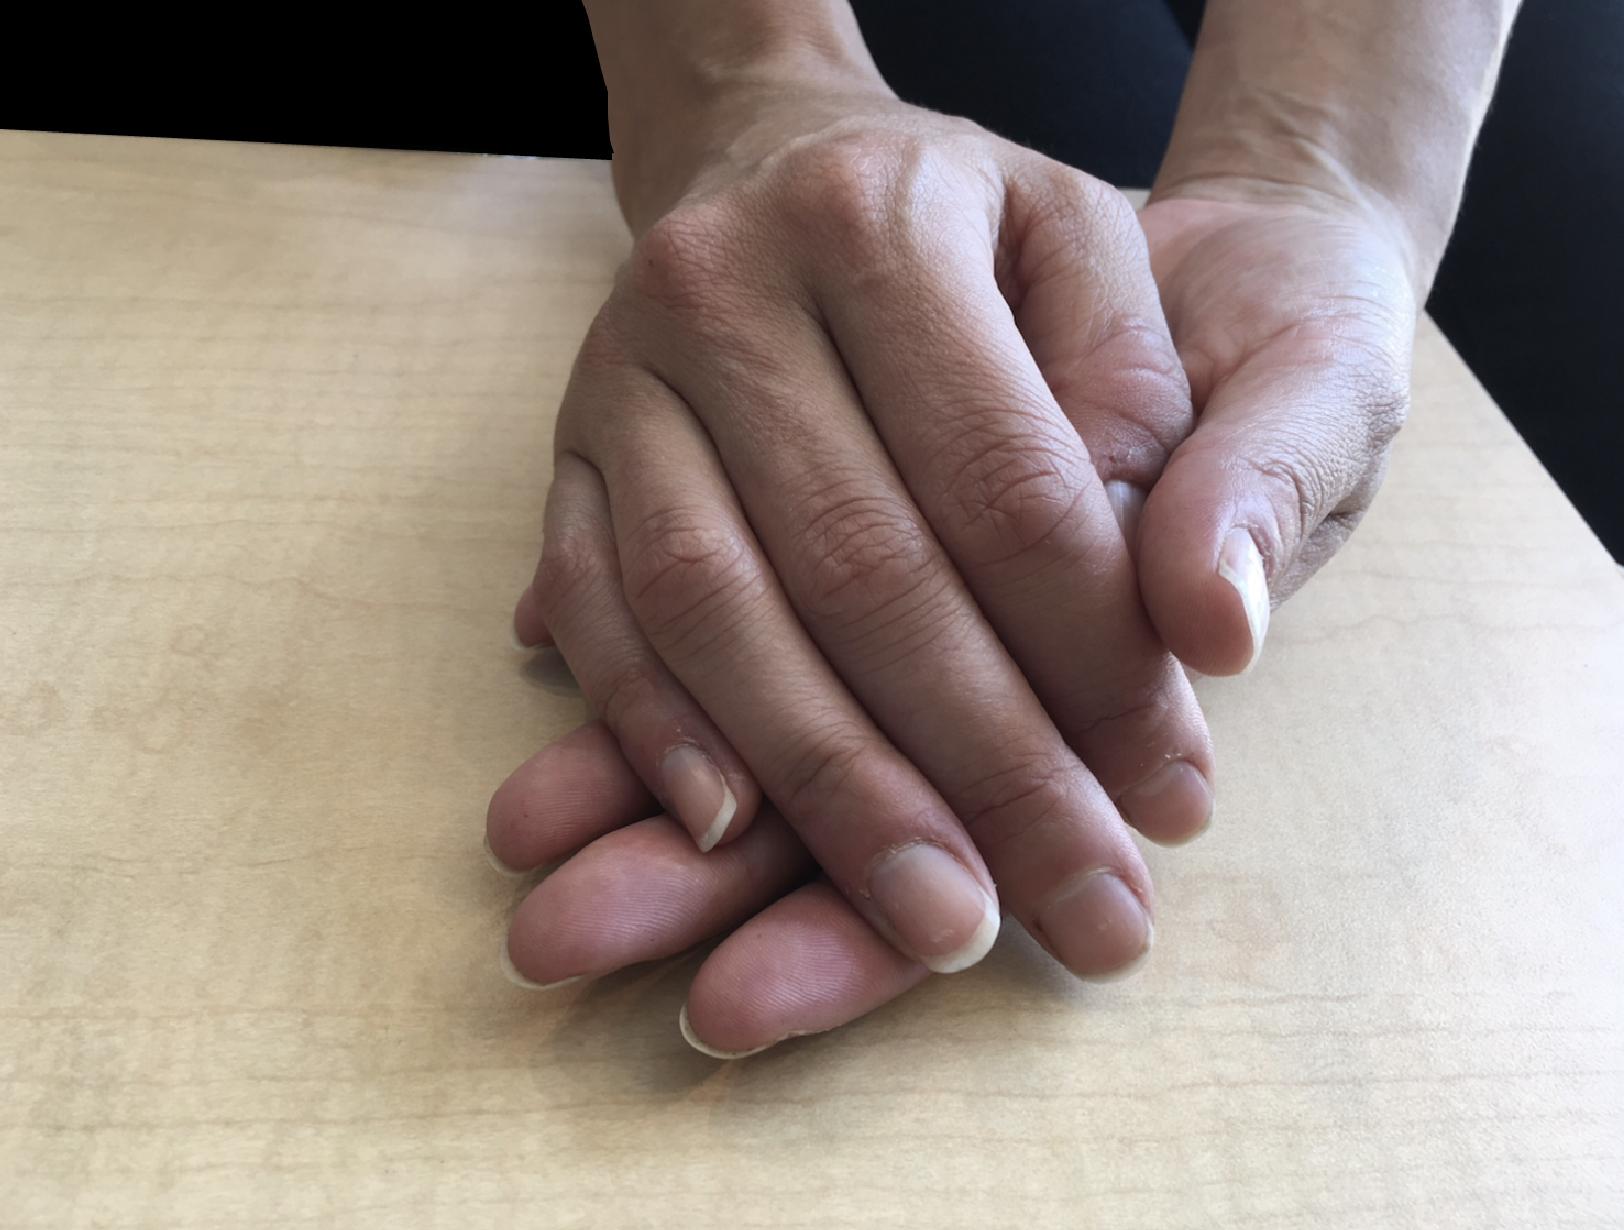 Photo of Melissa Cortona's hands, chef and butcher.